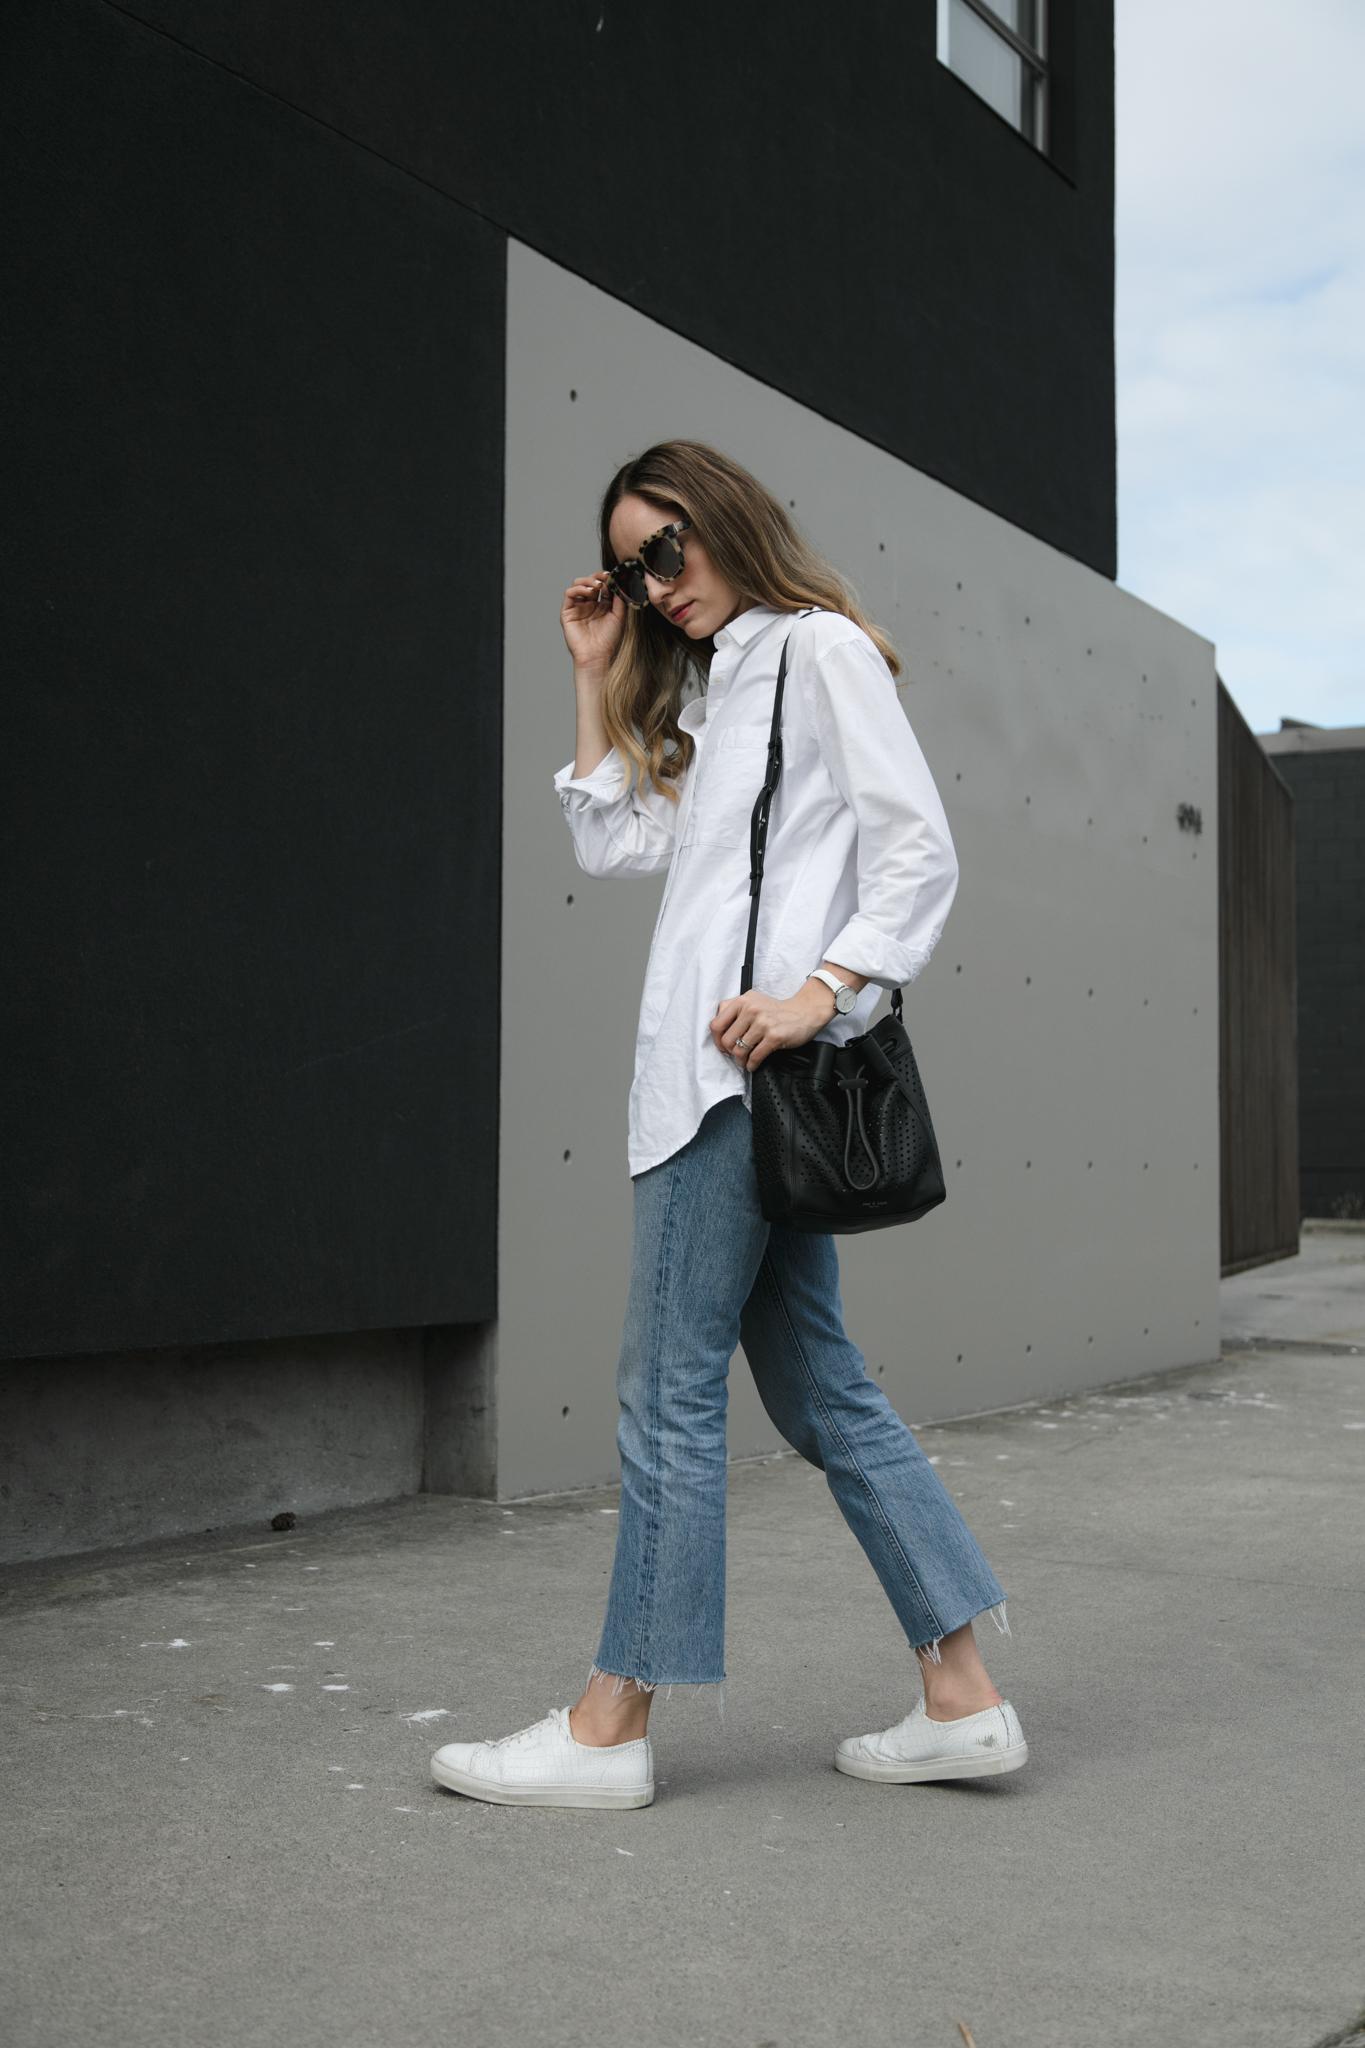 sharday-engel-frank-oak-shirt-fifth-sunglasses-helmut-lang-jeans5984.jpg